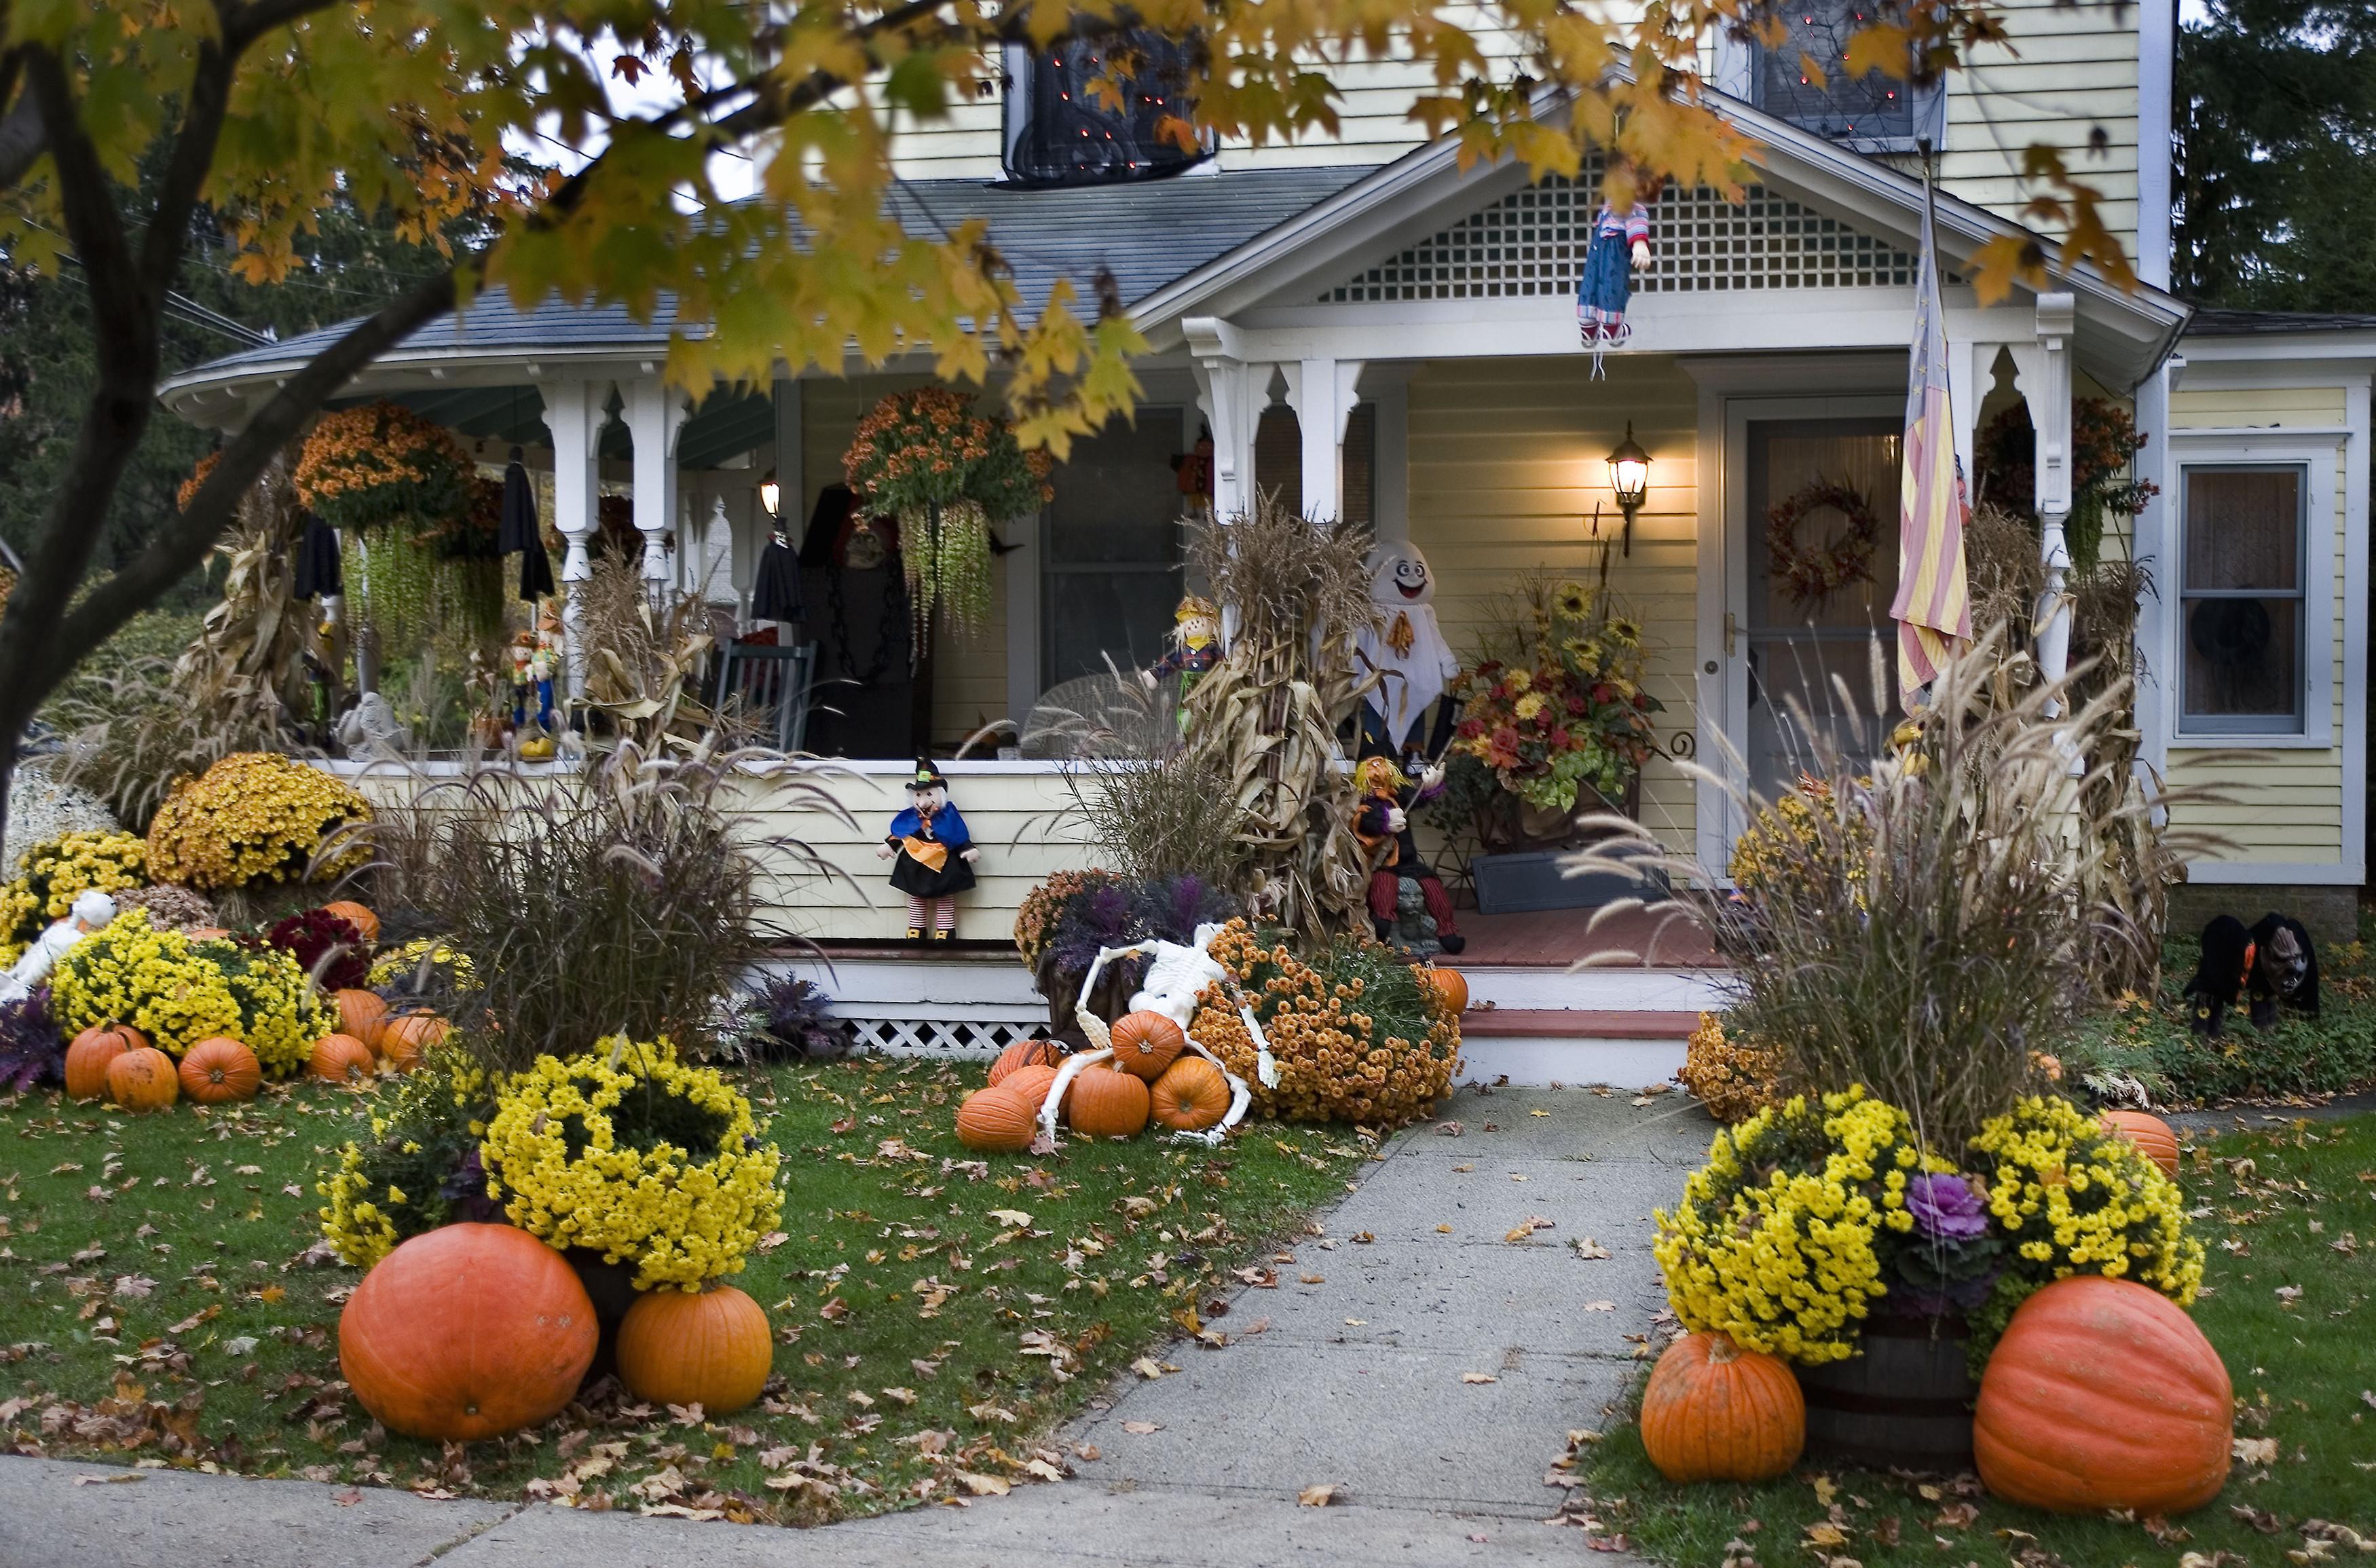 Halloween Decoration Outdoor  10 Best Outdoor Halloween Decorations Porch Decor Ideas